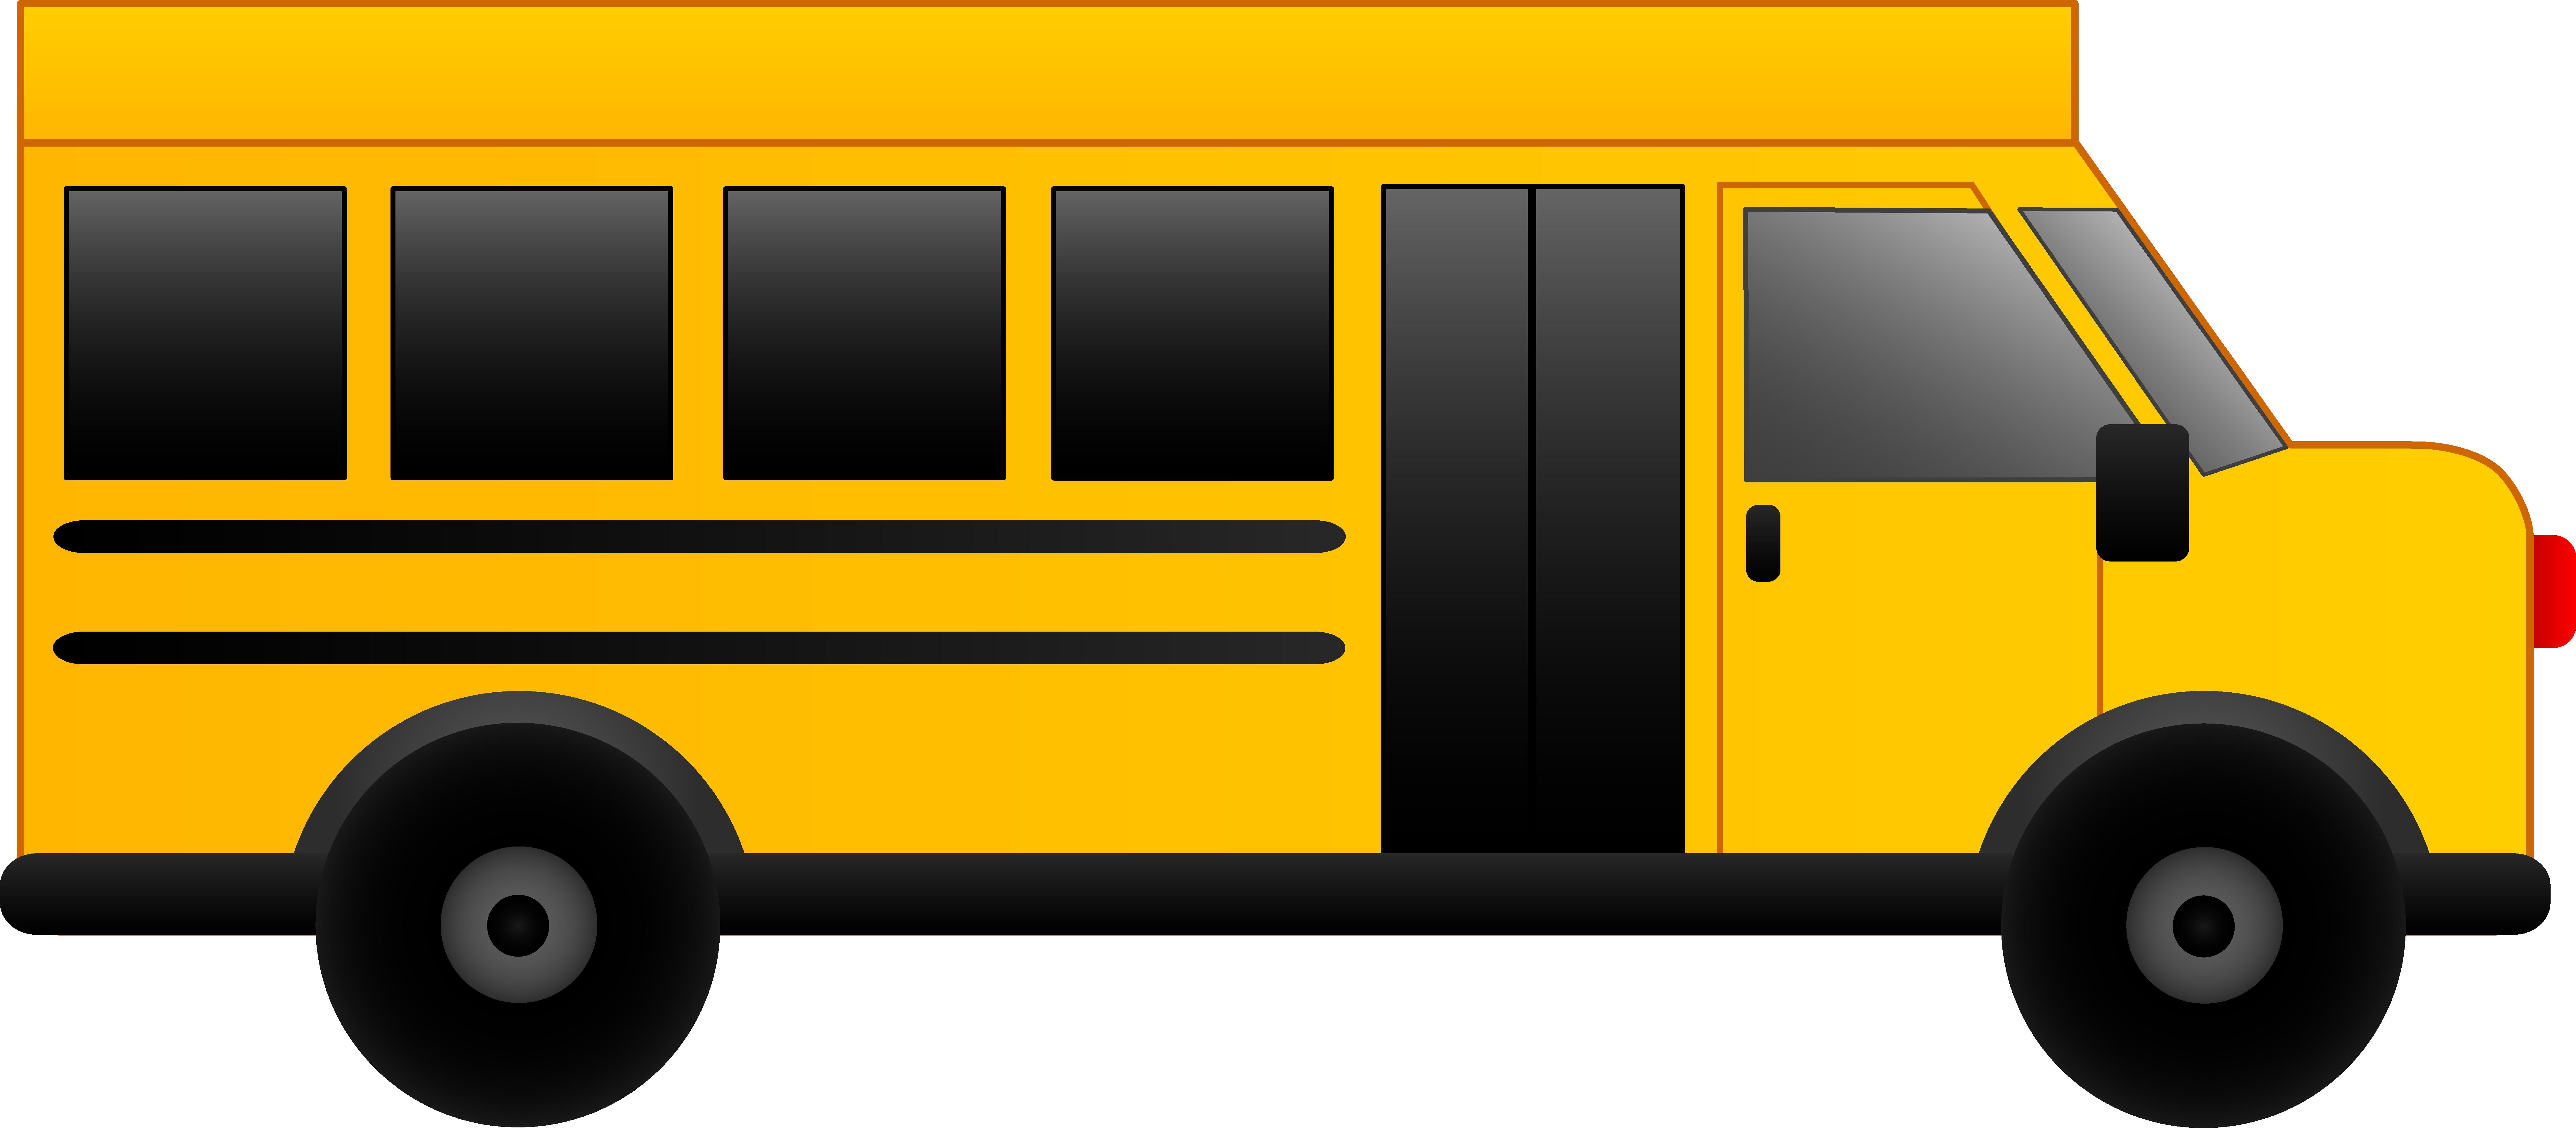 Bus clipart printable. School png vatican express